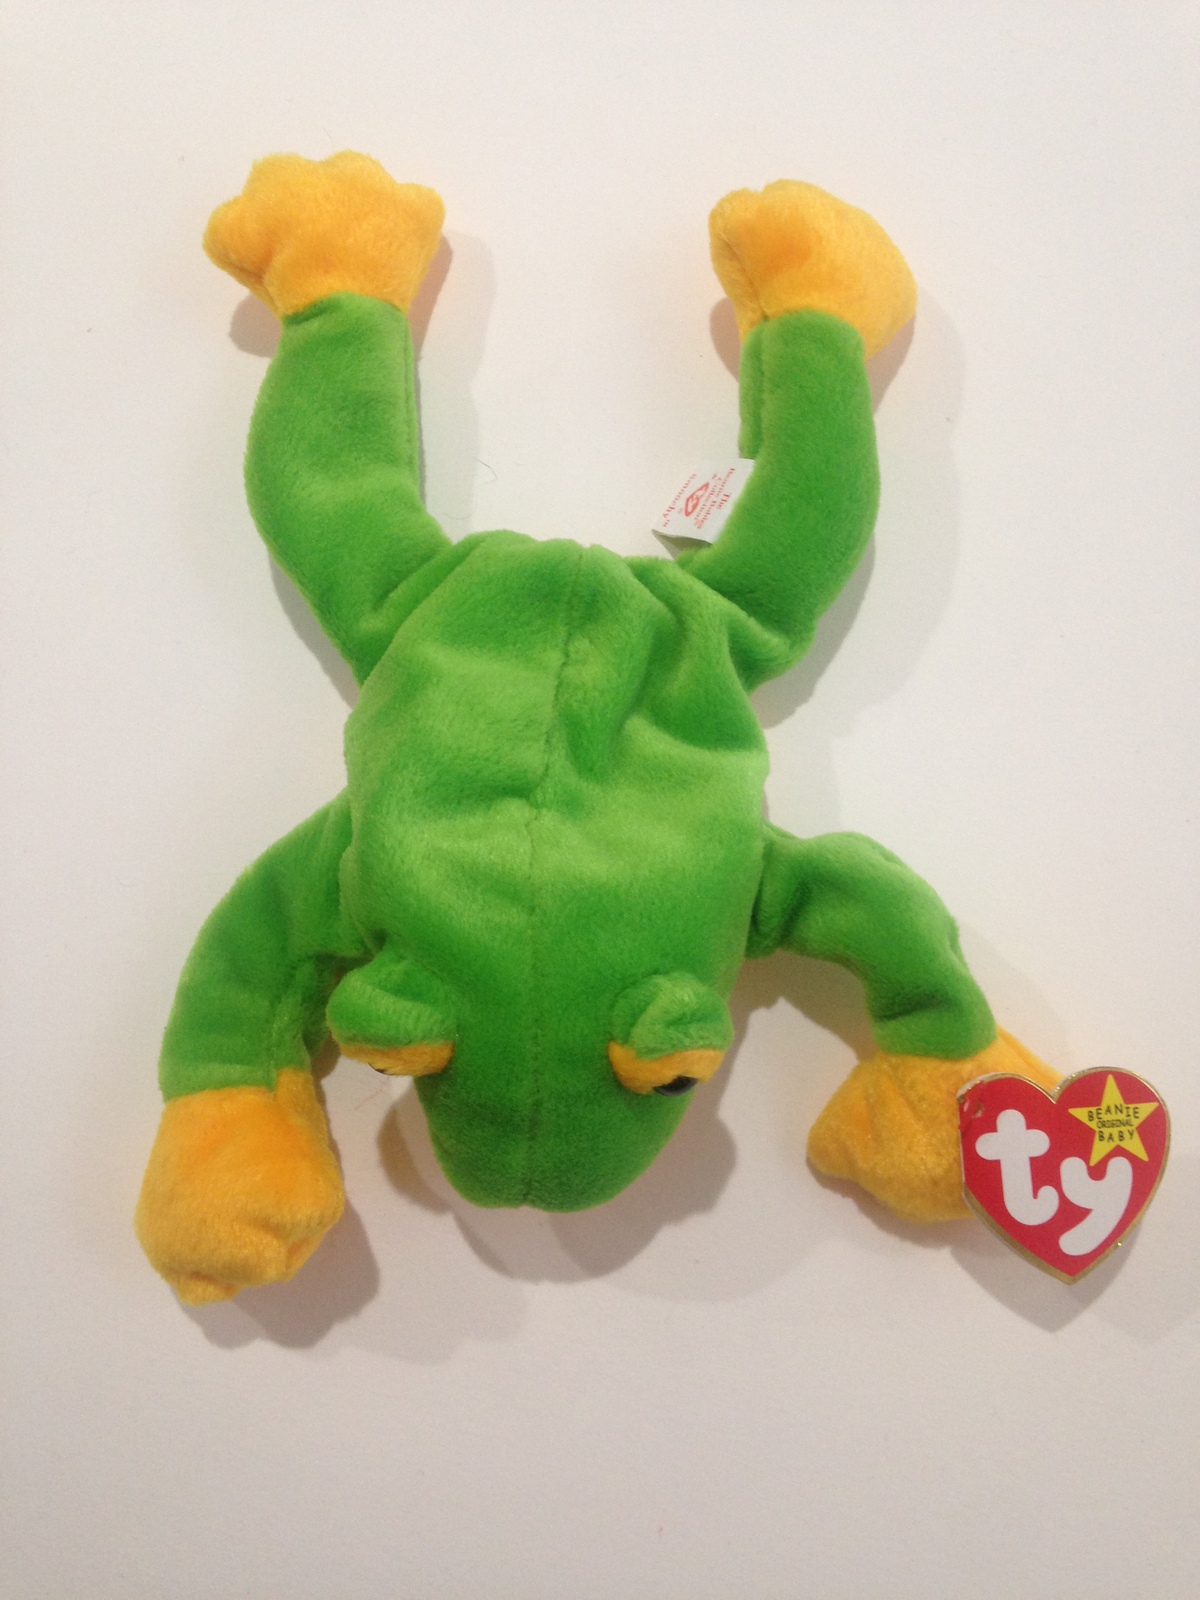 Smoochy Beanie Baby Retired 1997 and similar items. Img 6515 4c1d085e0d0